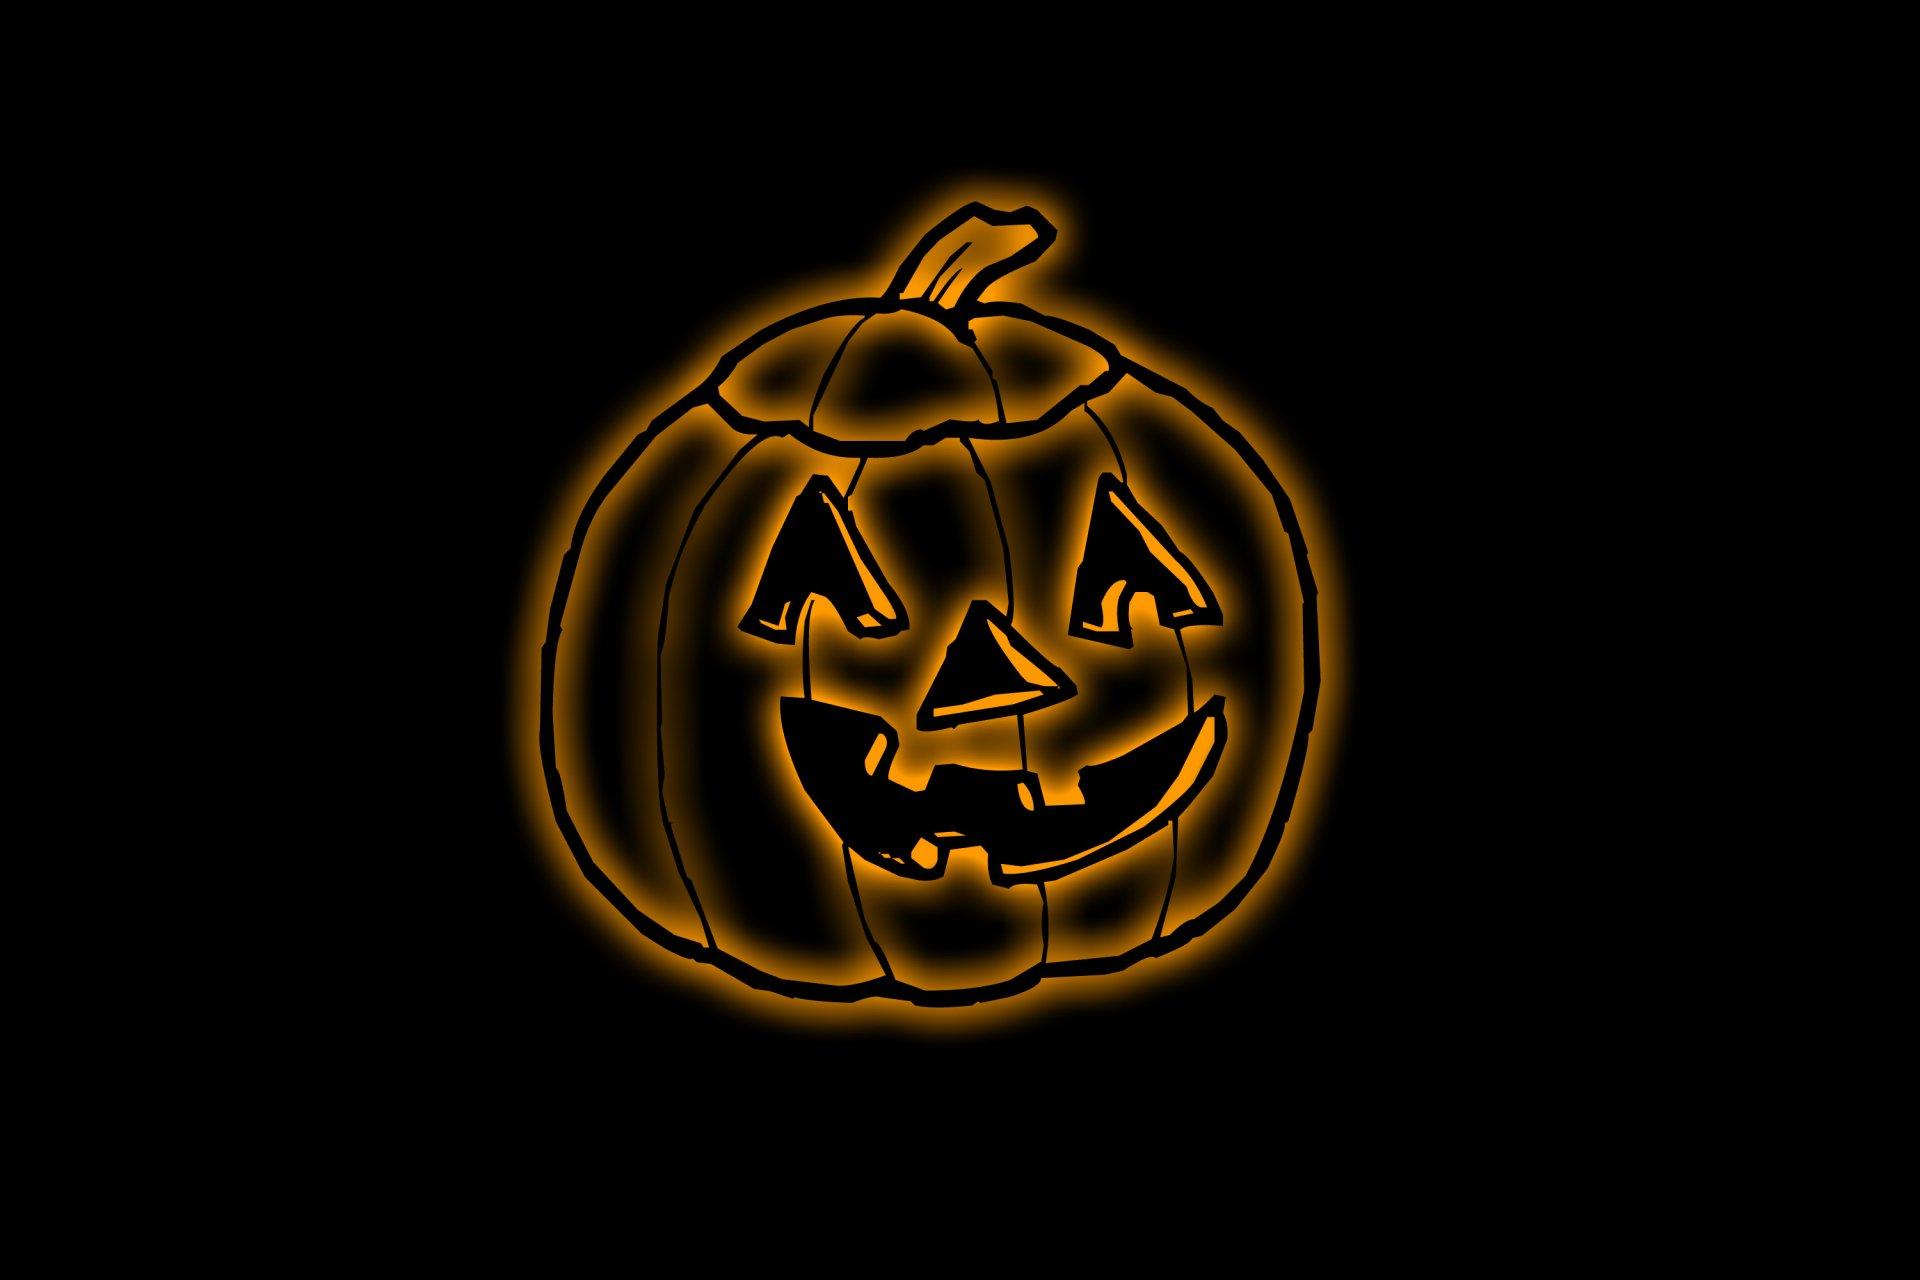 Holiday - Halloween  Pumpkin Jack-o'-lantern Wallpaper